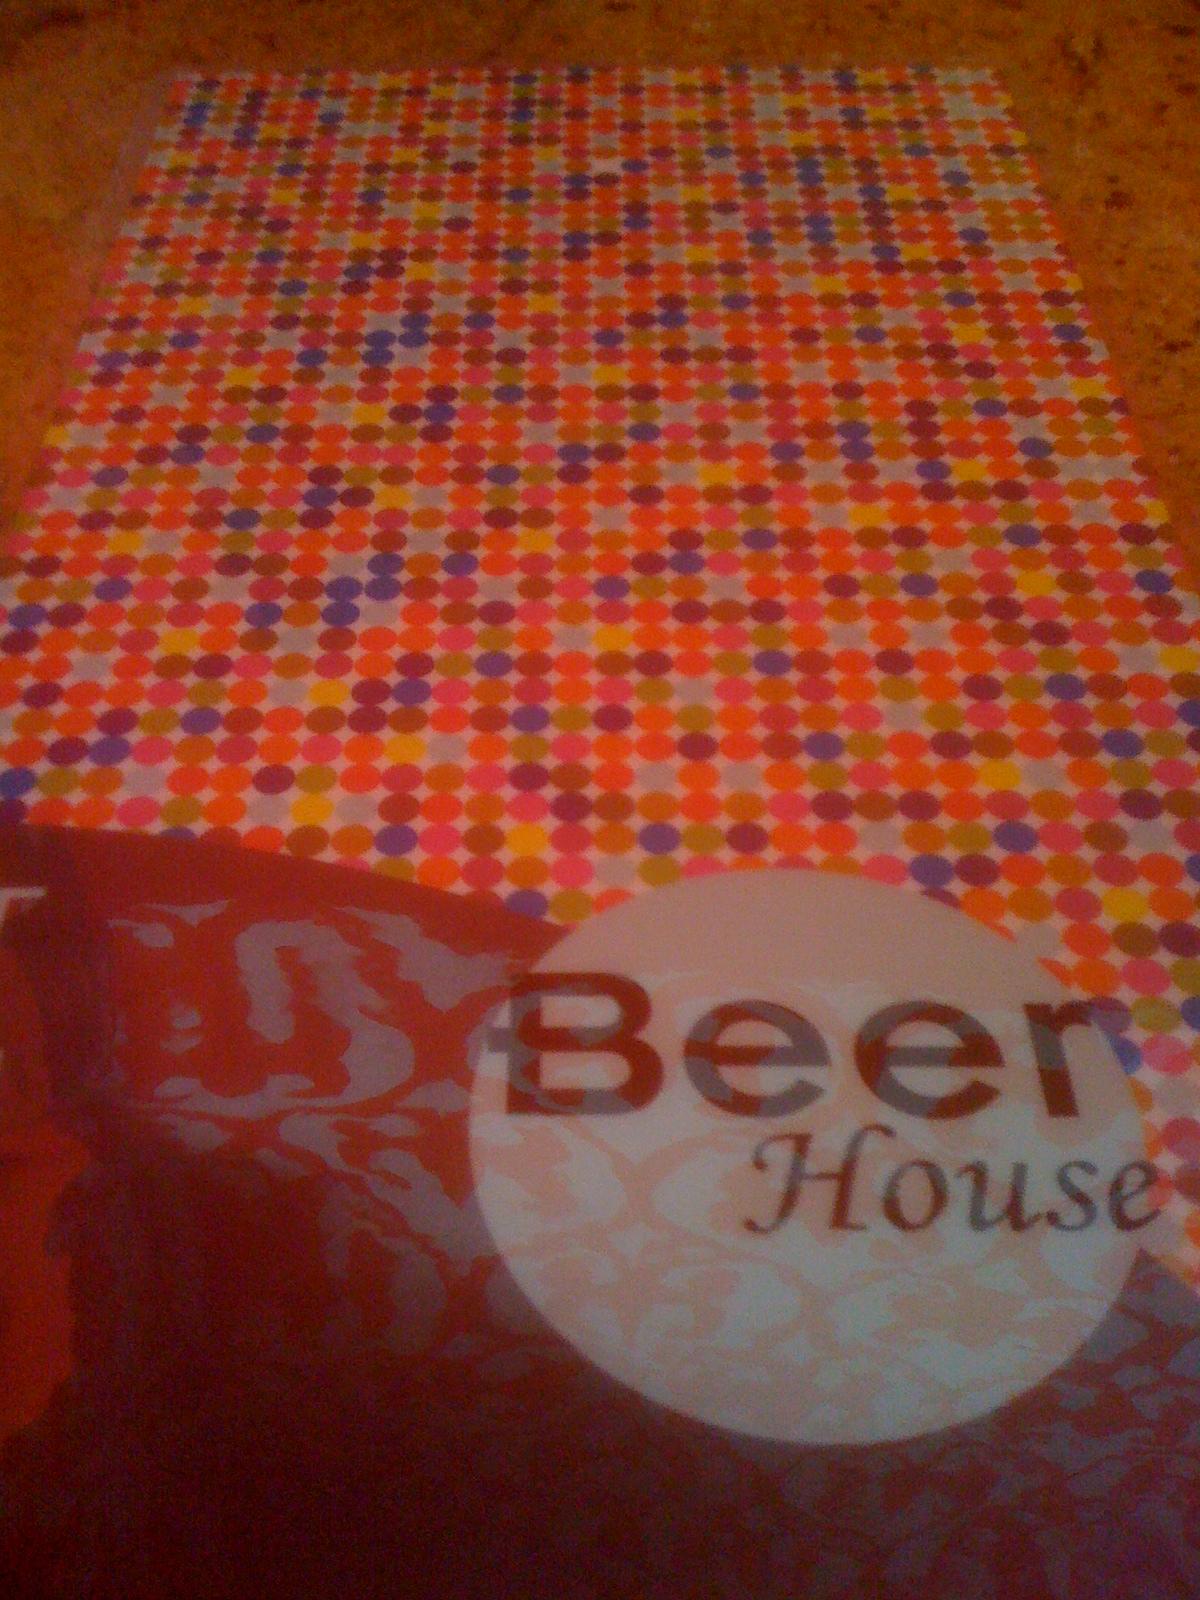 custom carpet design matches restaurant decor front window